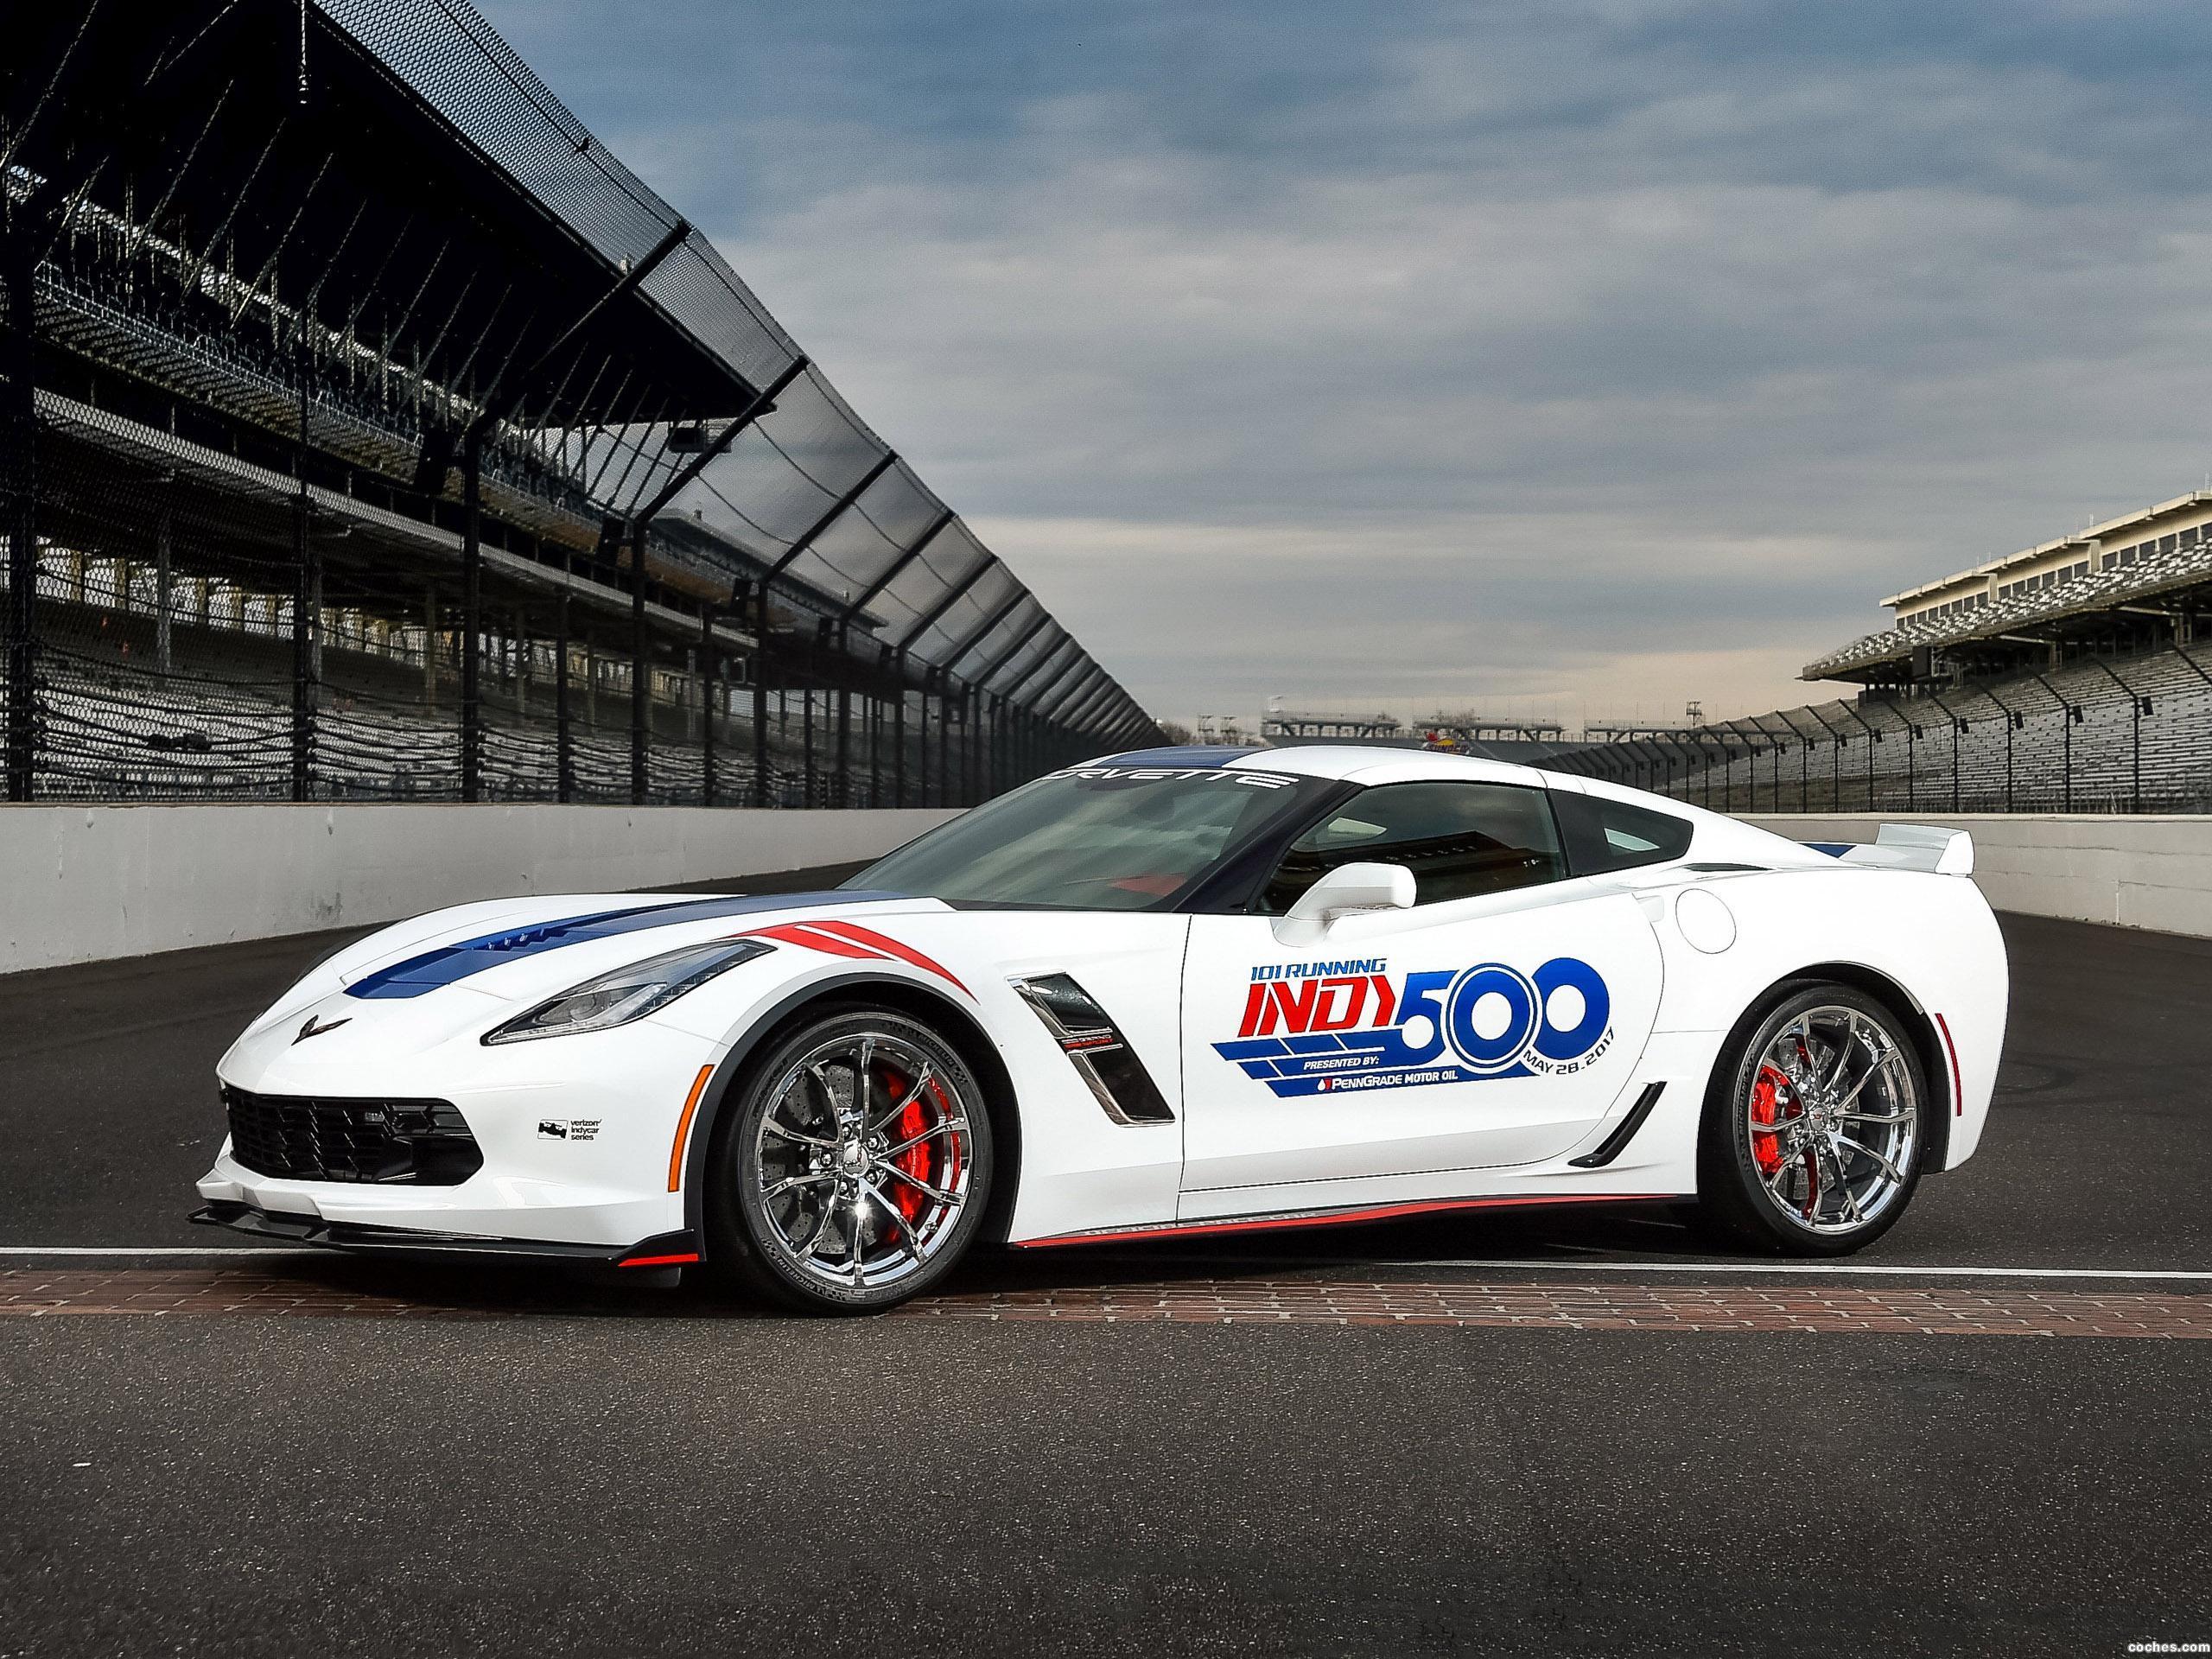 corvette_c7-grand-sport-indy-500-pace-car-2017_r6.jpg